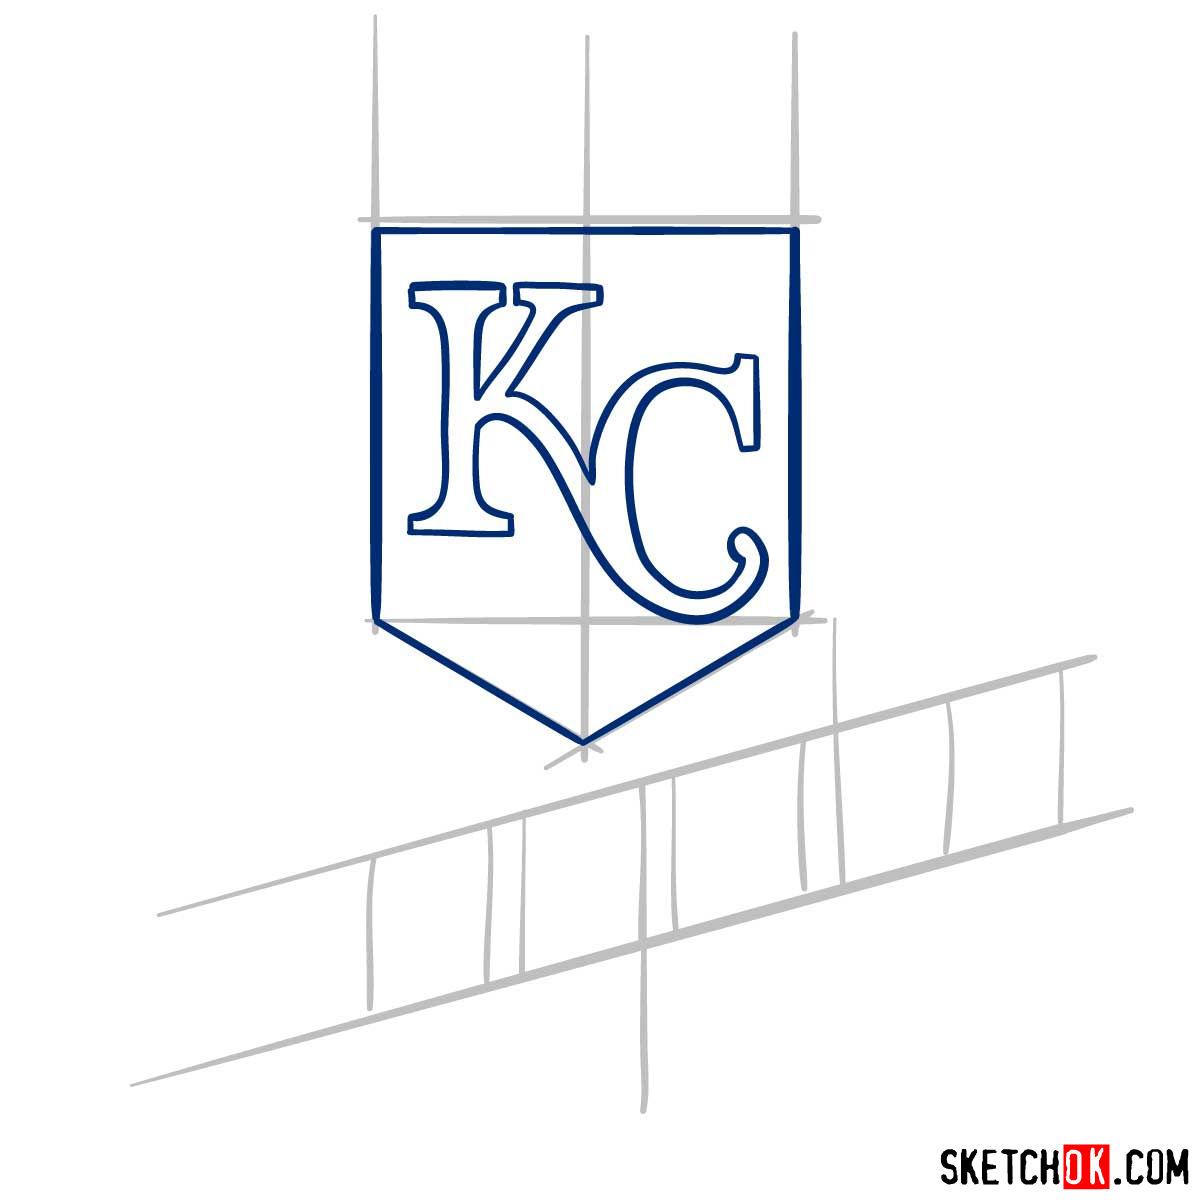 How to draw Kansas City Royals logo | MLB logos - step 04